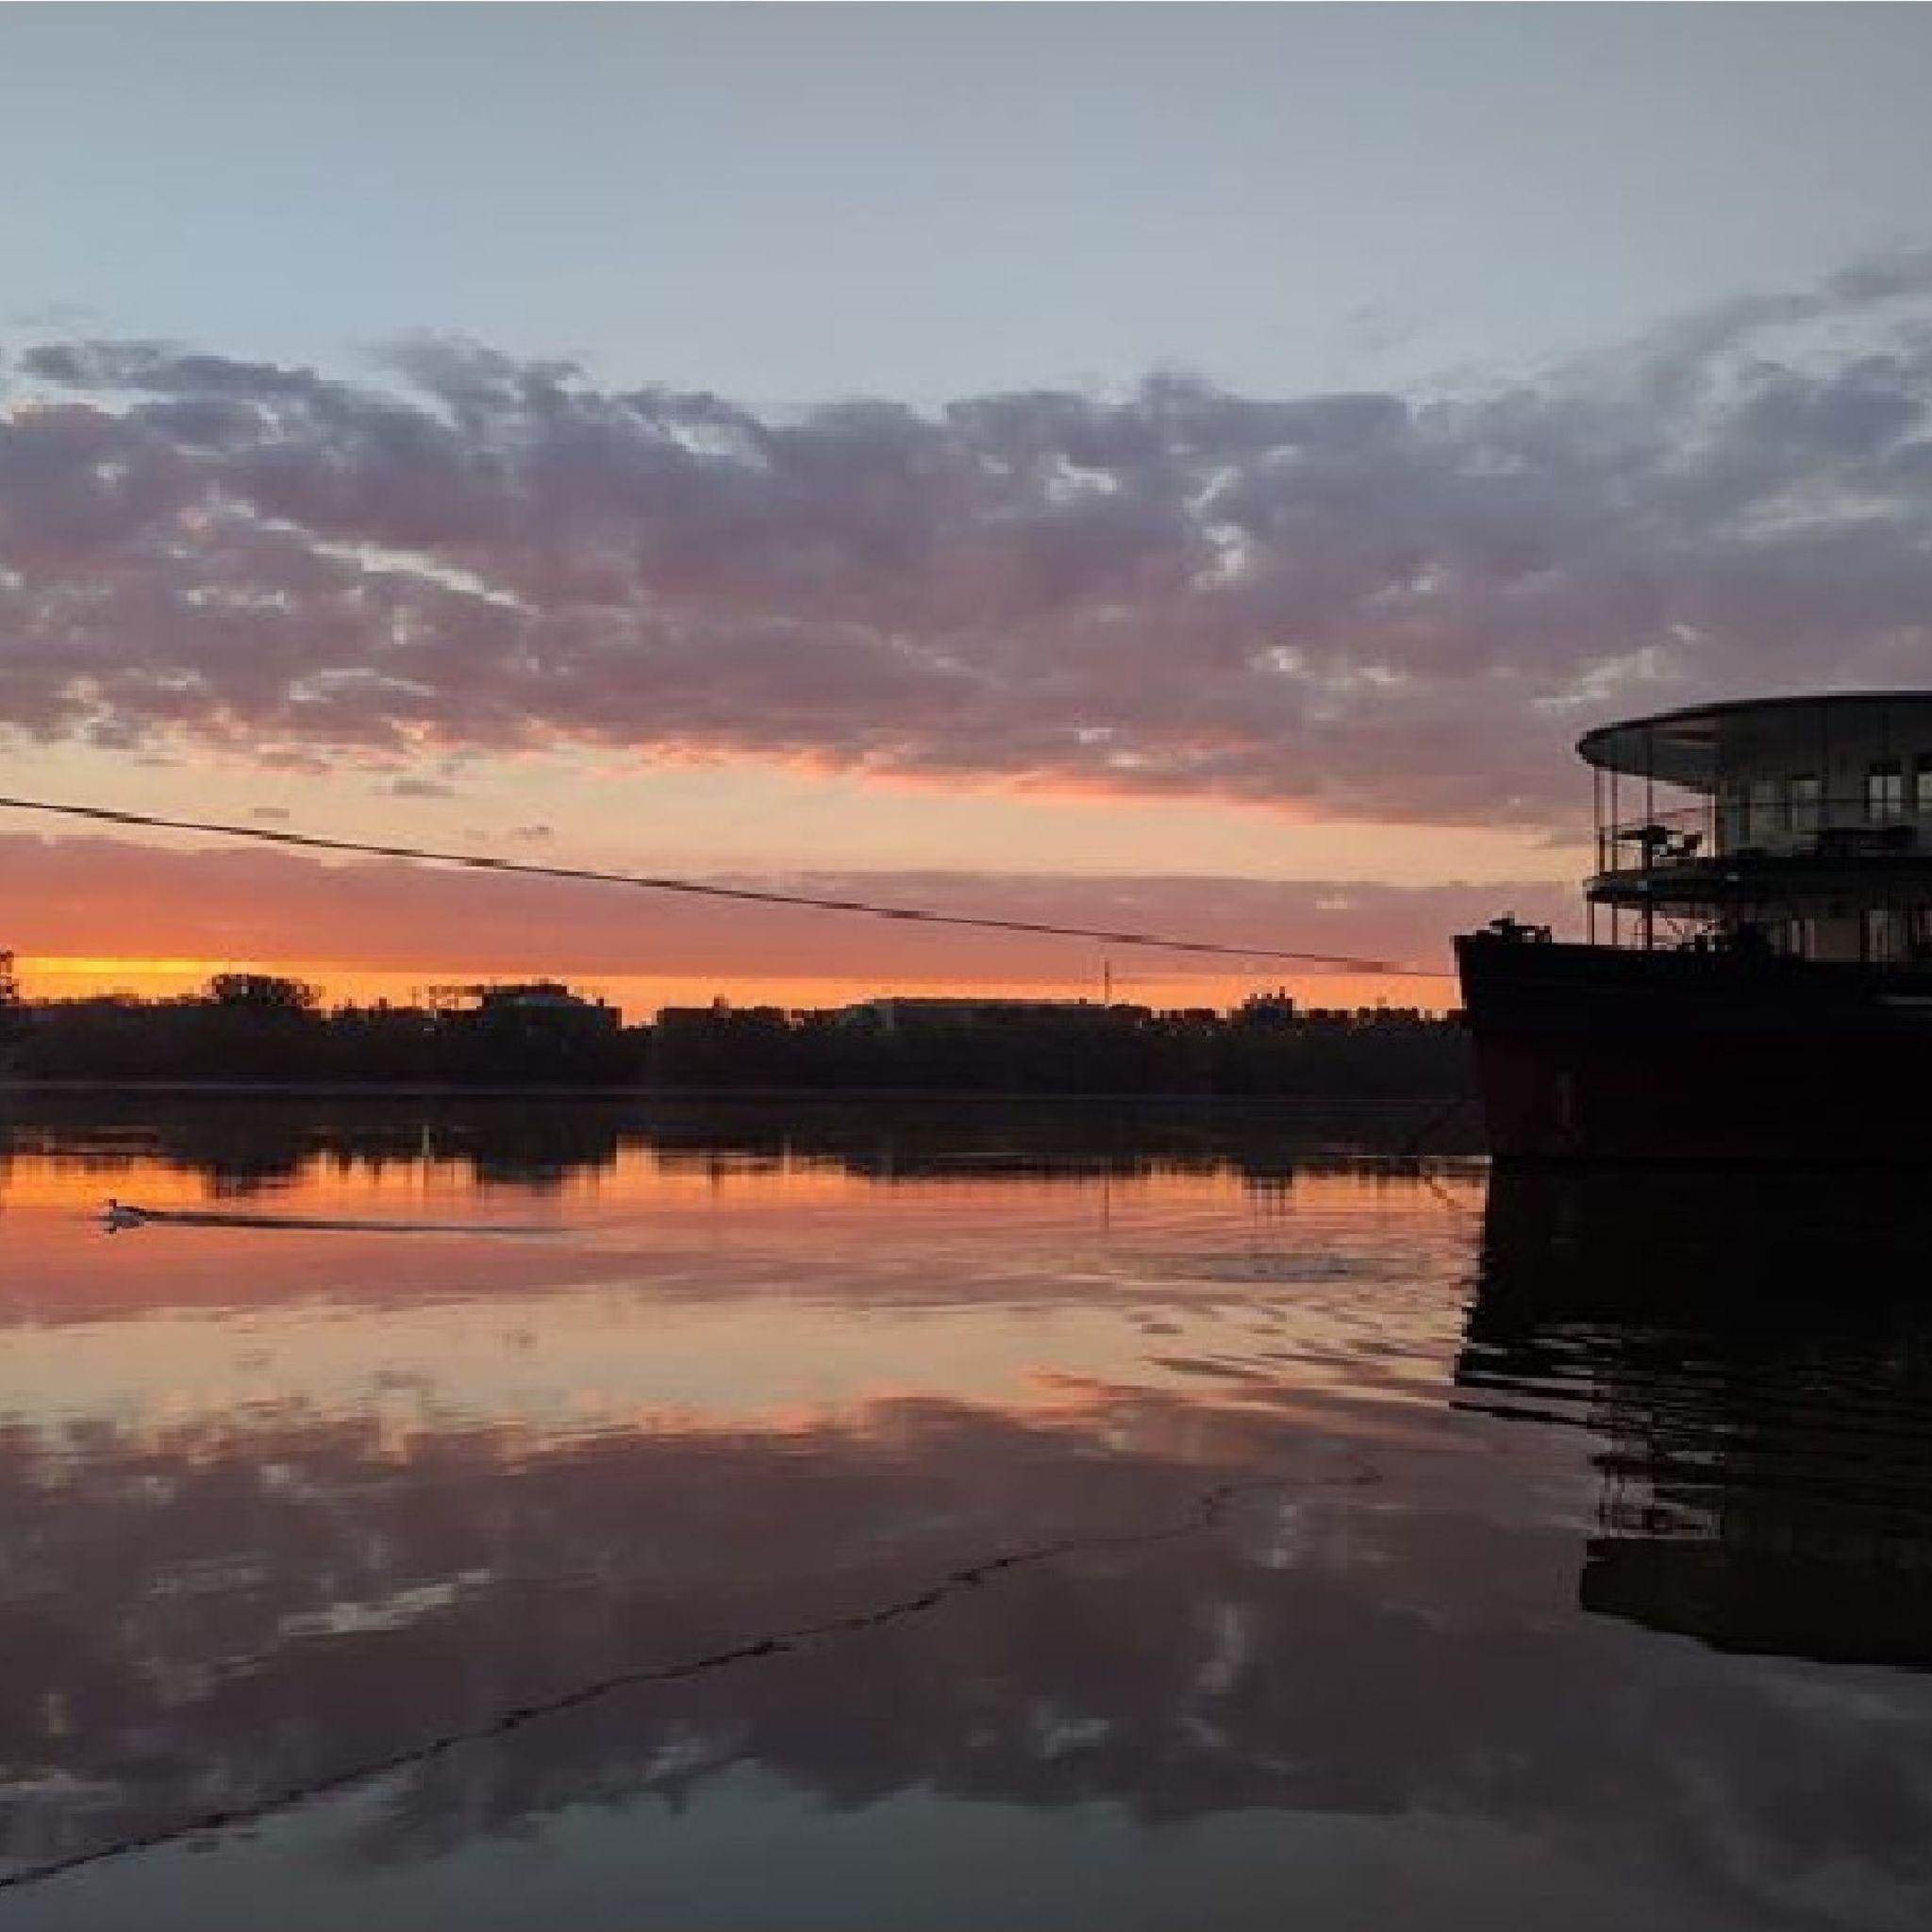 Aquamarina Boathotel & Rendezvényhajó Budapest - Napfelkelte